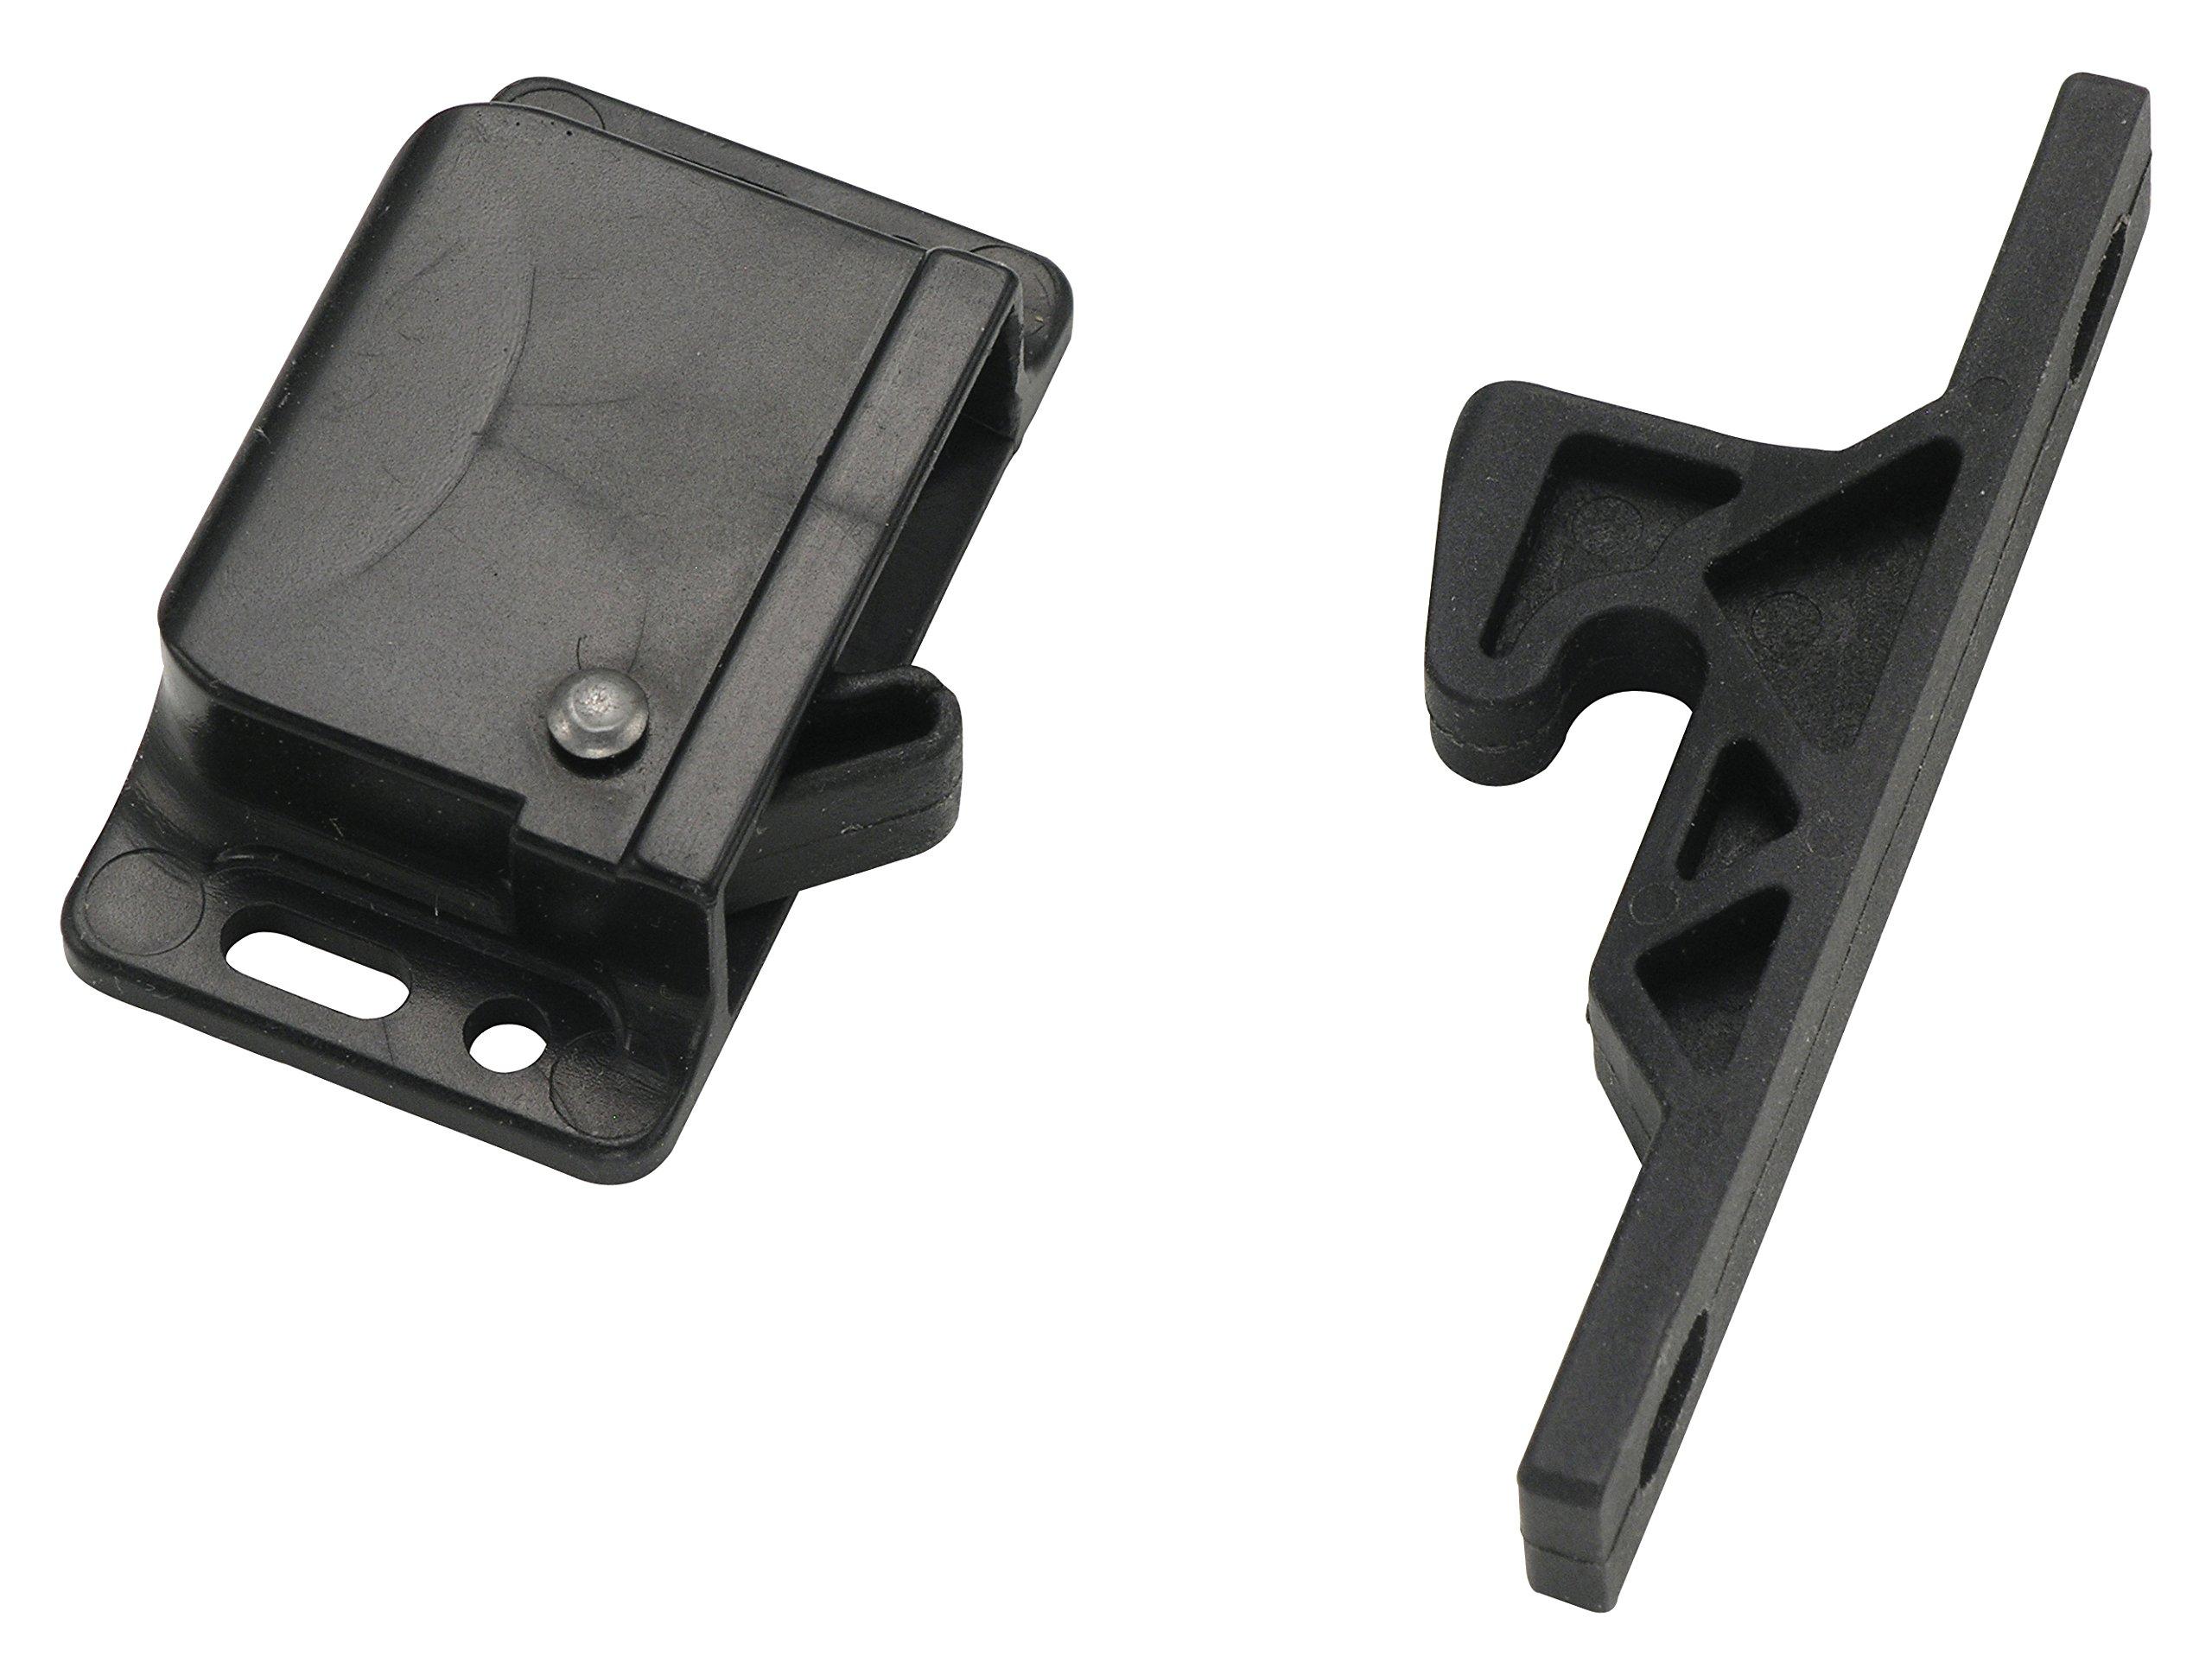 Decorite 5838 - RV Black Push Latch - 5lb - C3-805 - H315 (10)